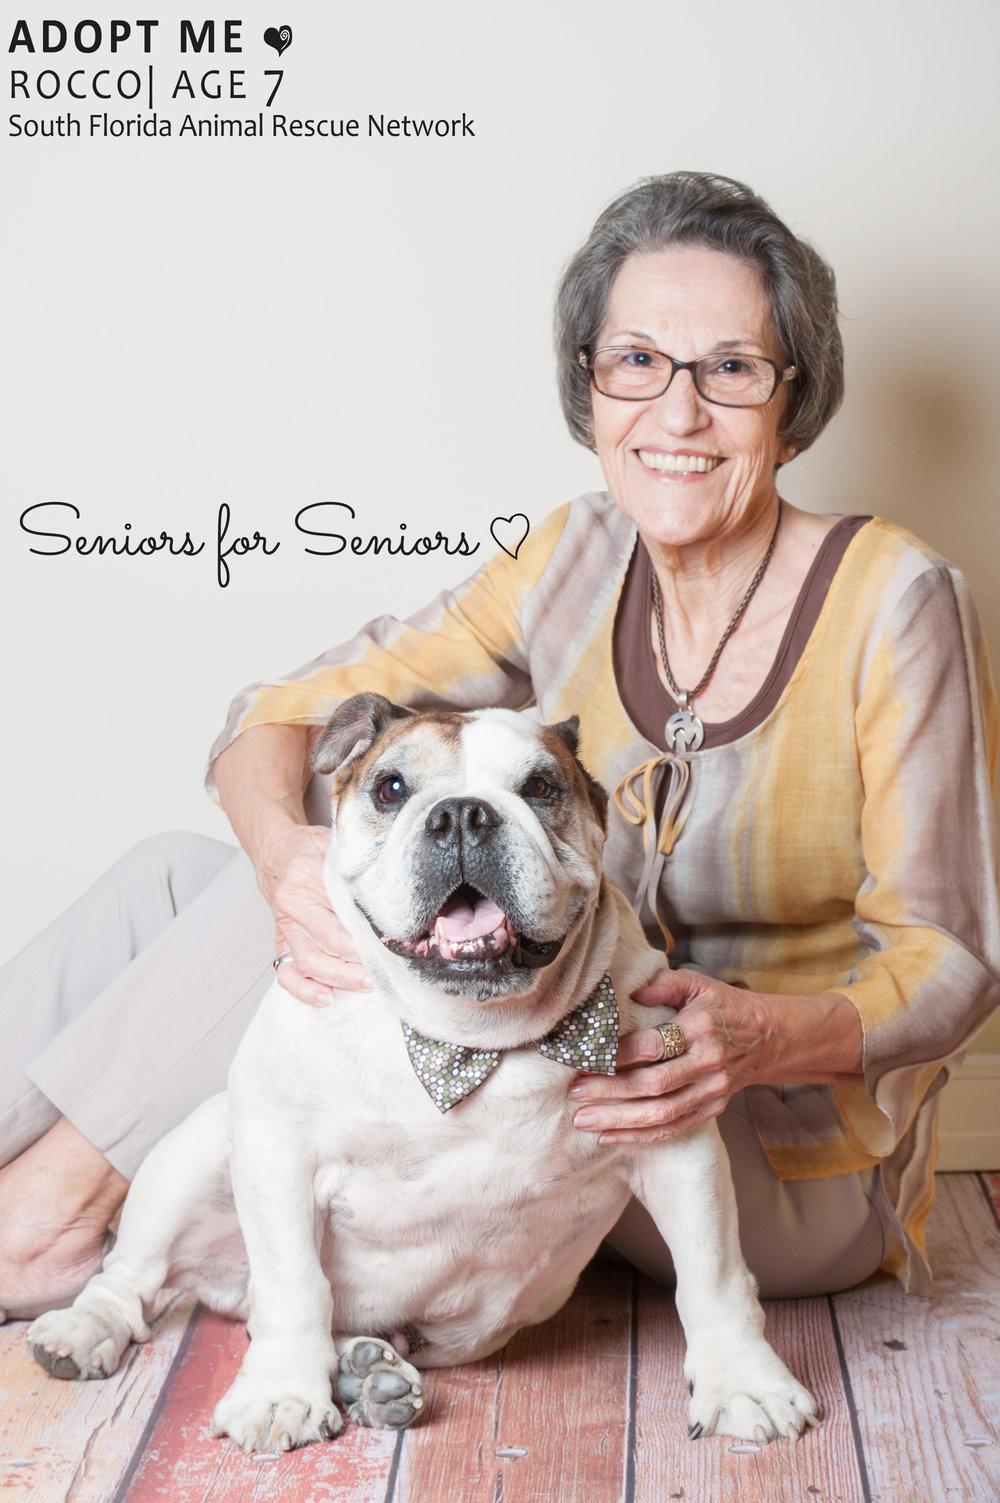 seniorsforseniors_rocco2.jpg